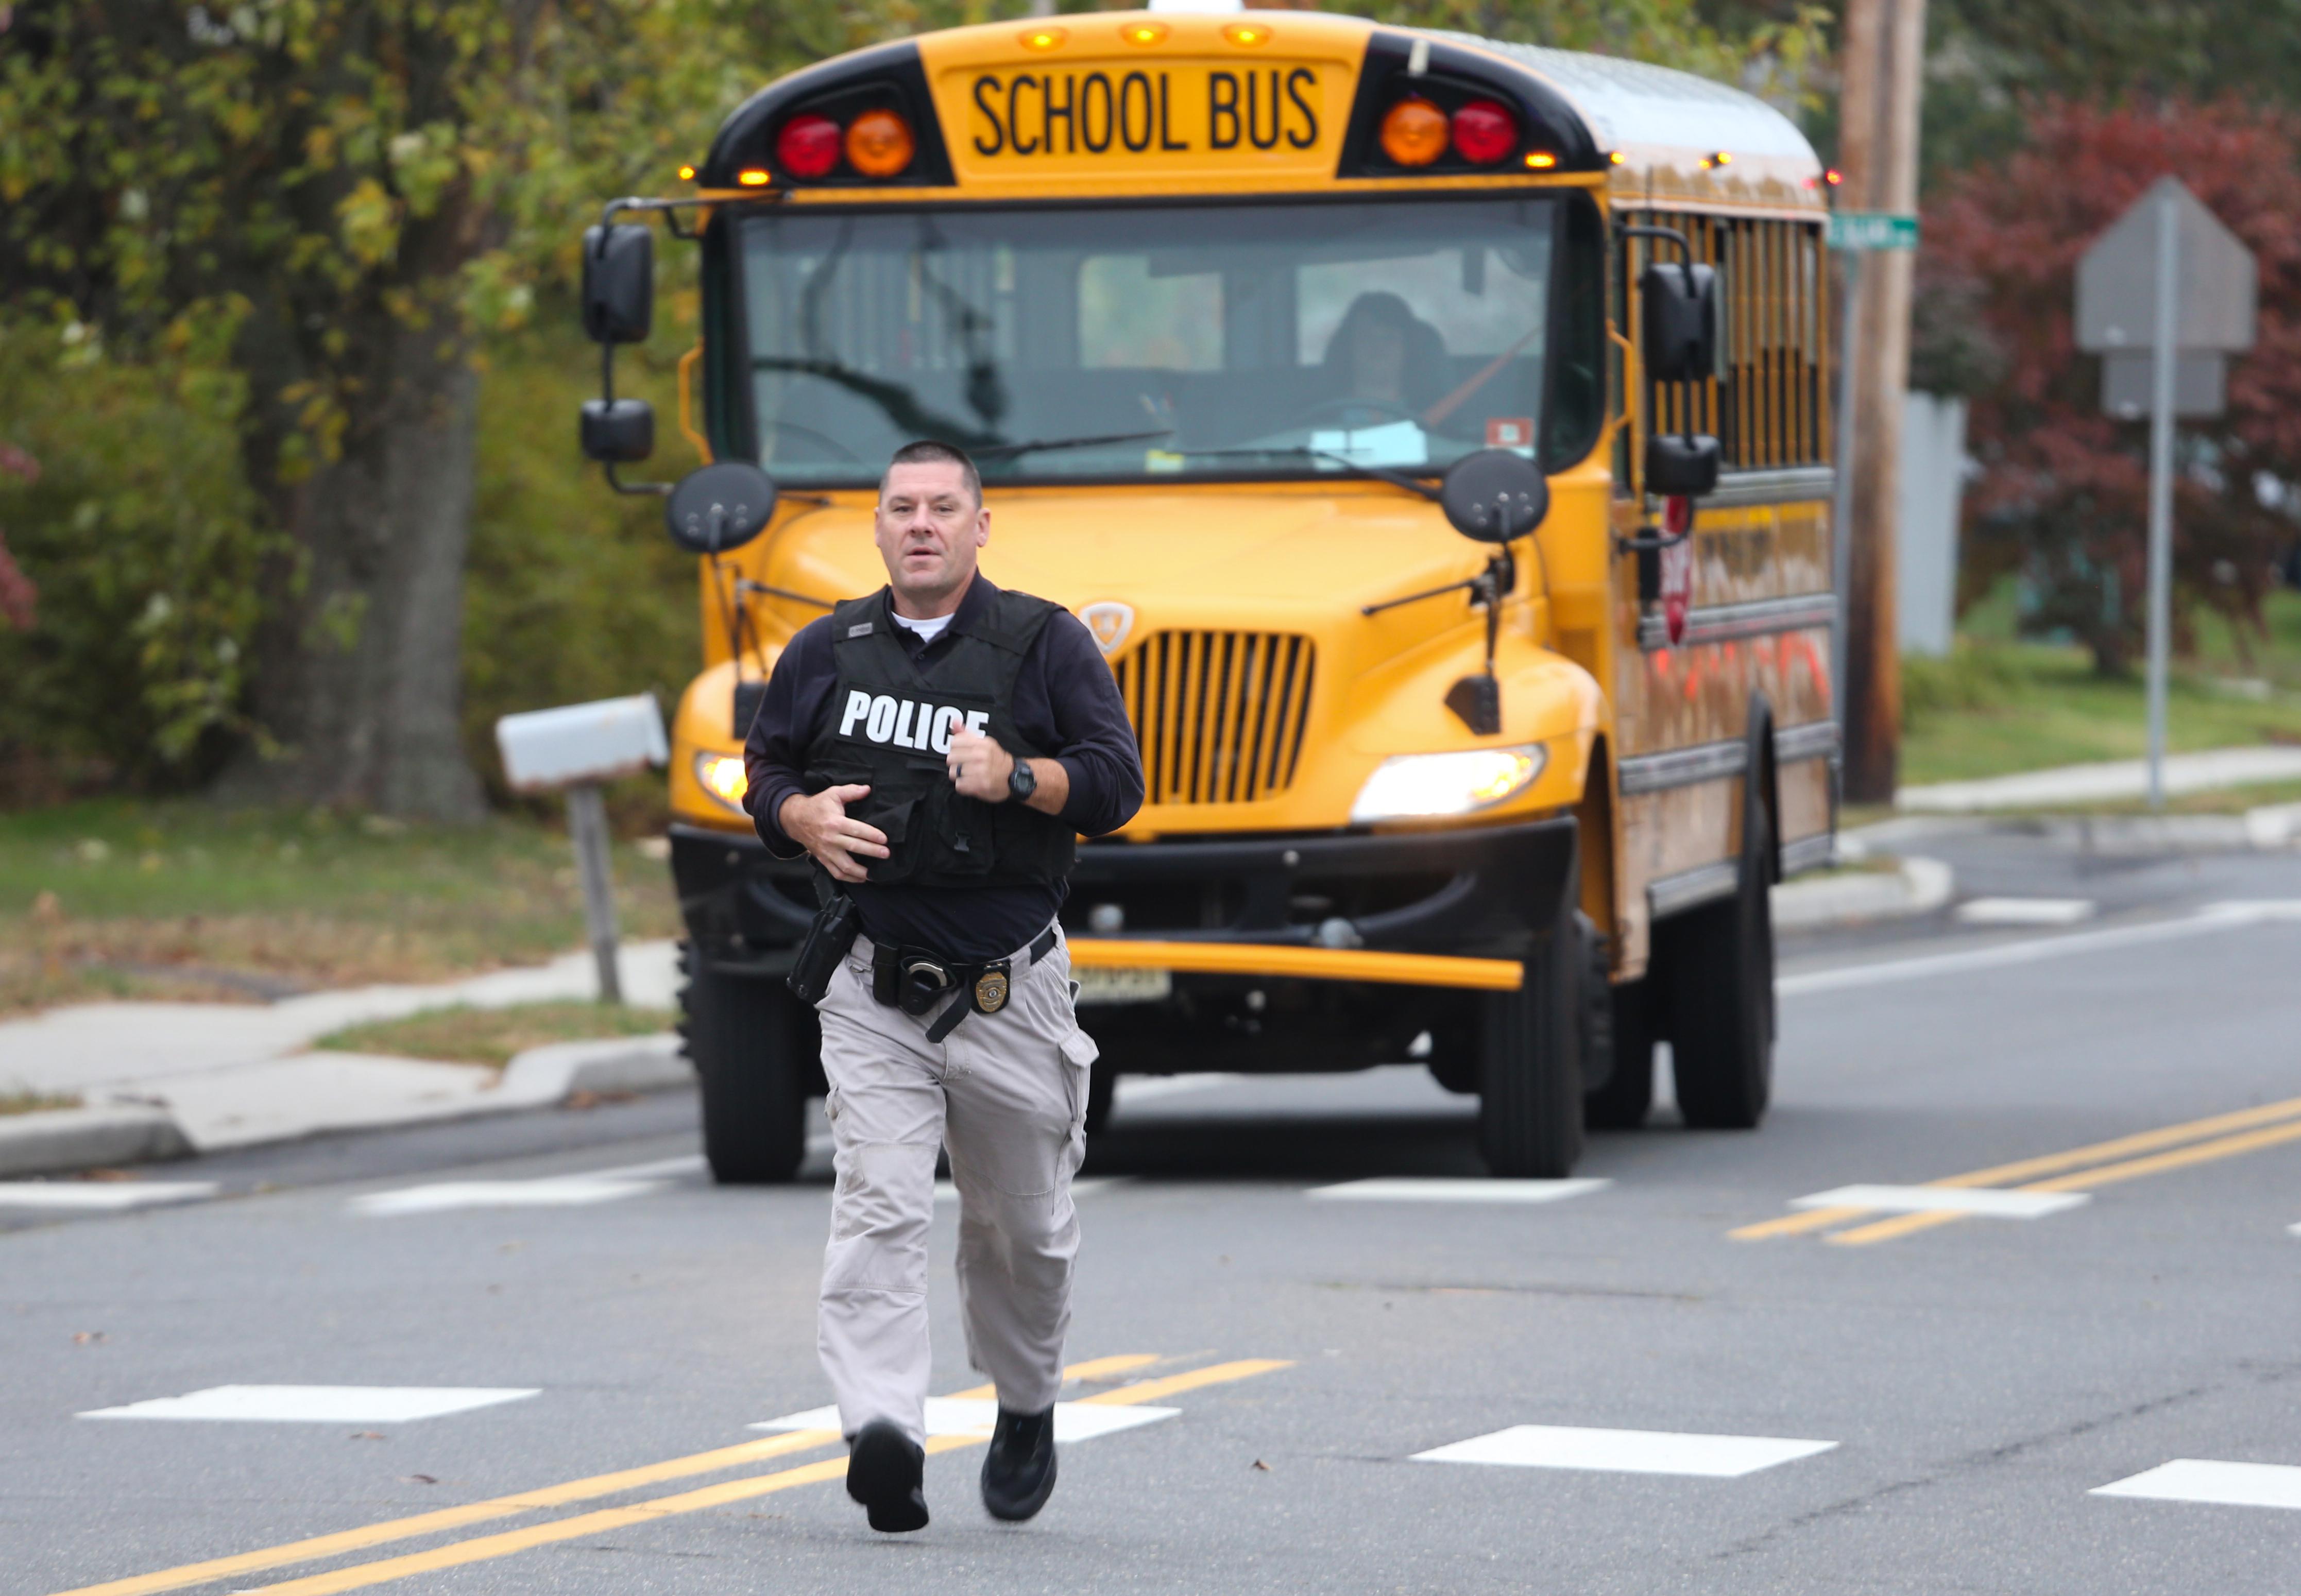 16-year-old shot near his N.J. high school ran back inside seeking help, prompting lockdown